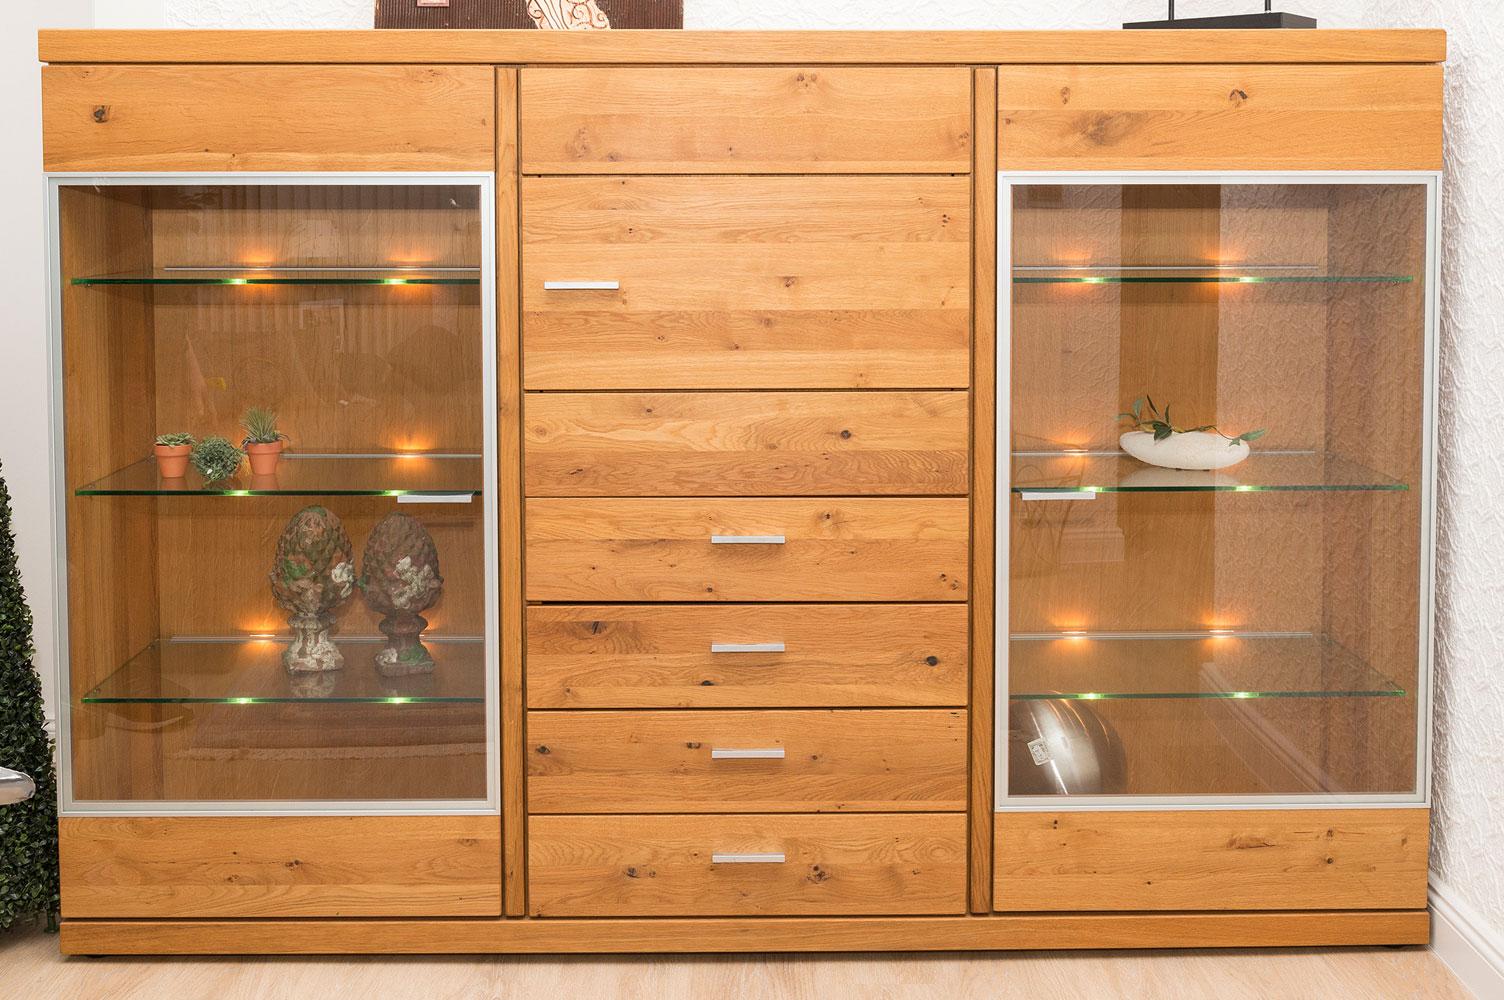 highboard mit glaselementen m bel schmidt waldb ckelheim. Black Bedroom Furniture Sets. Home Design Ideas